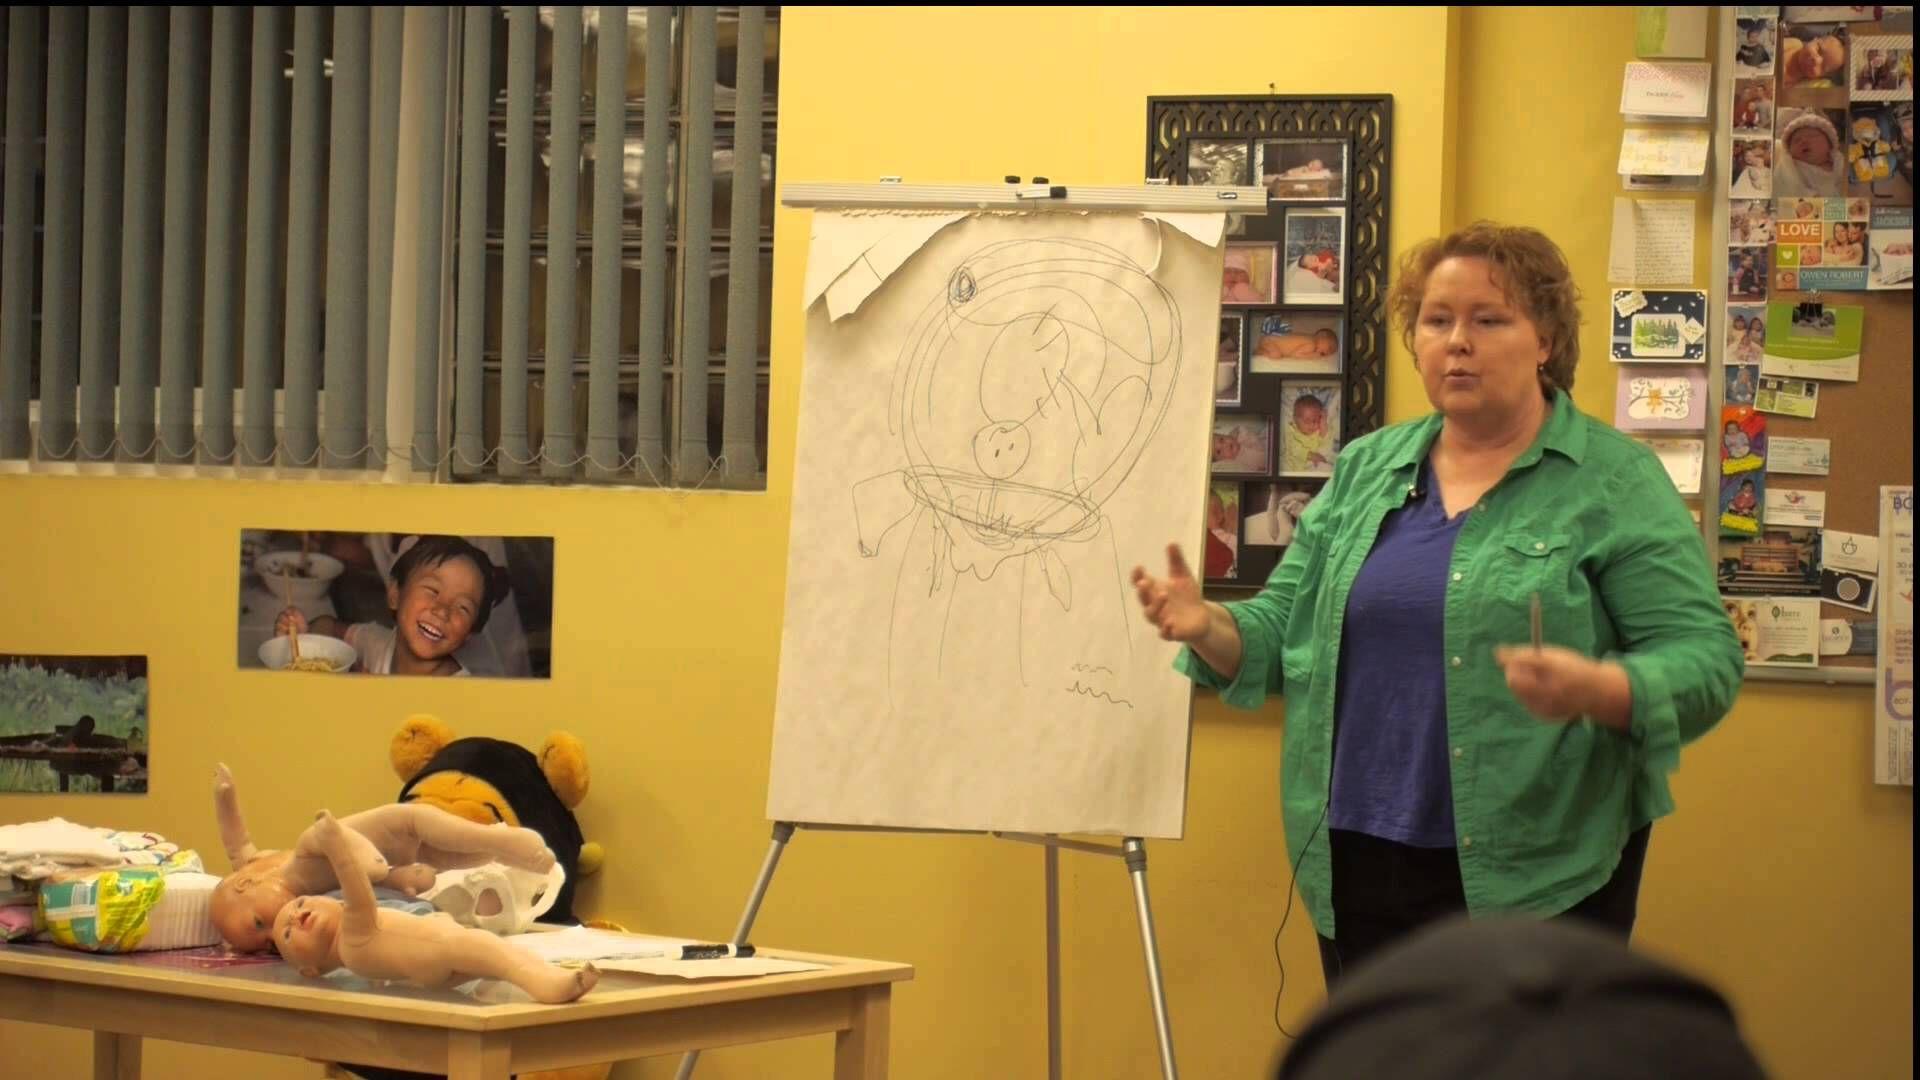 Midwife Holliday Tyson teaching a Prenatal Class at